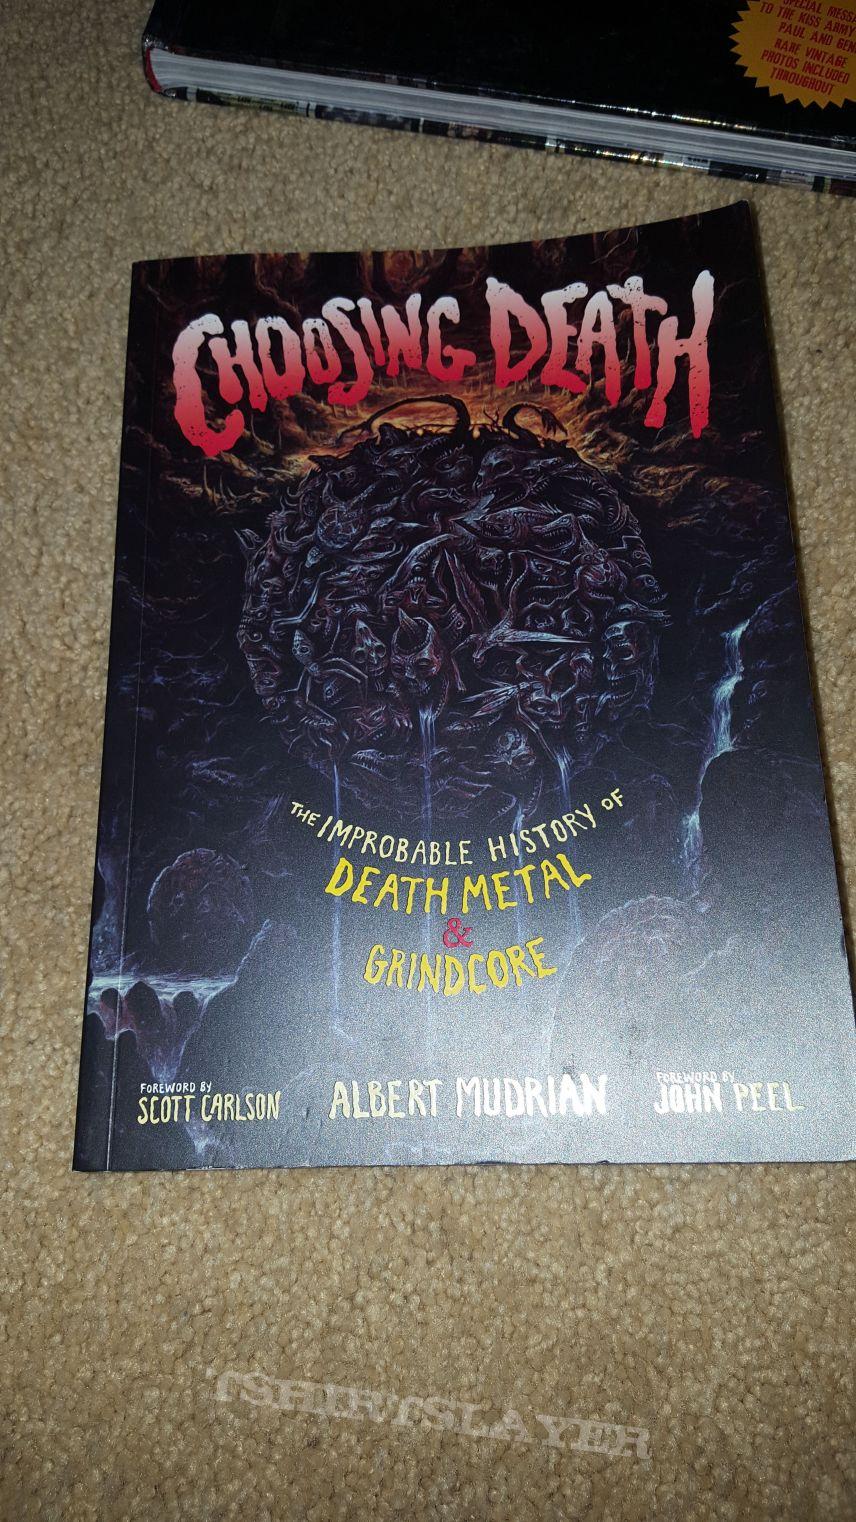 Metal literature